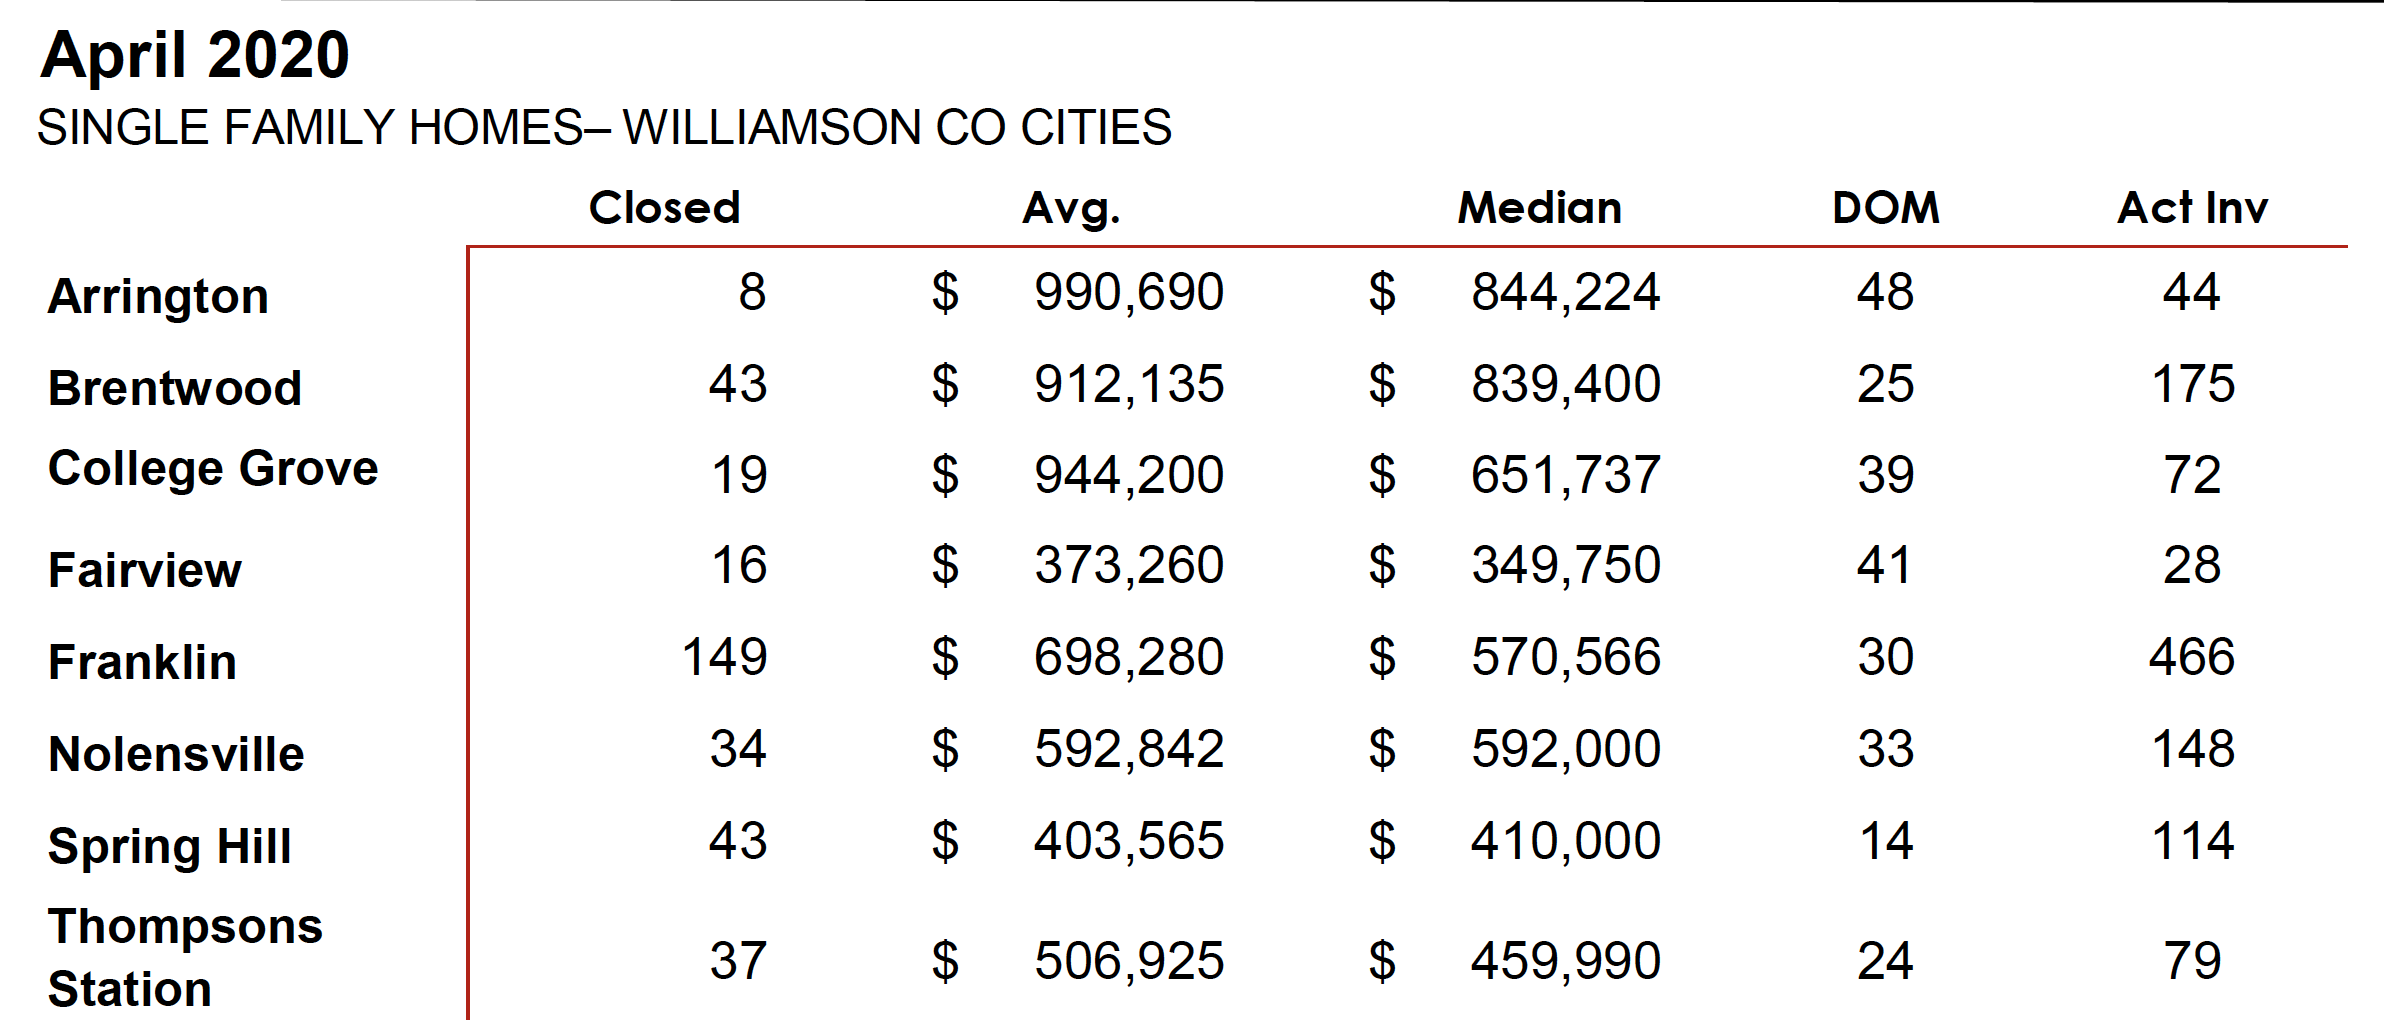 April 2020 Williamson Co. Sales Stats 3